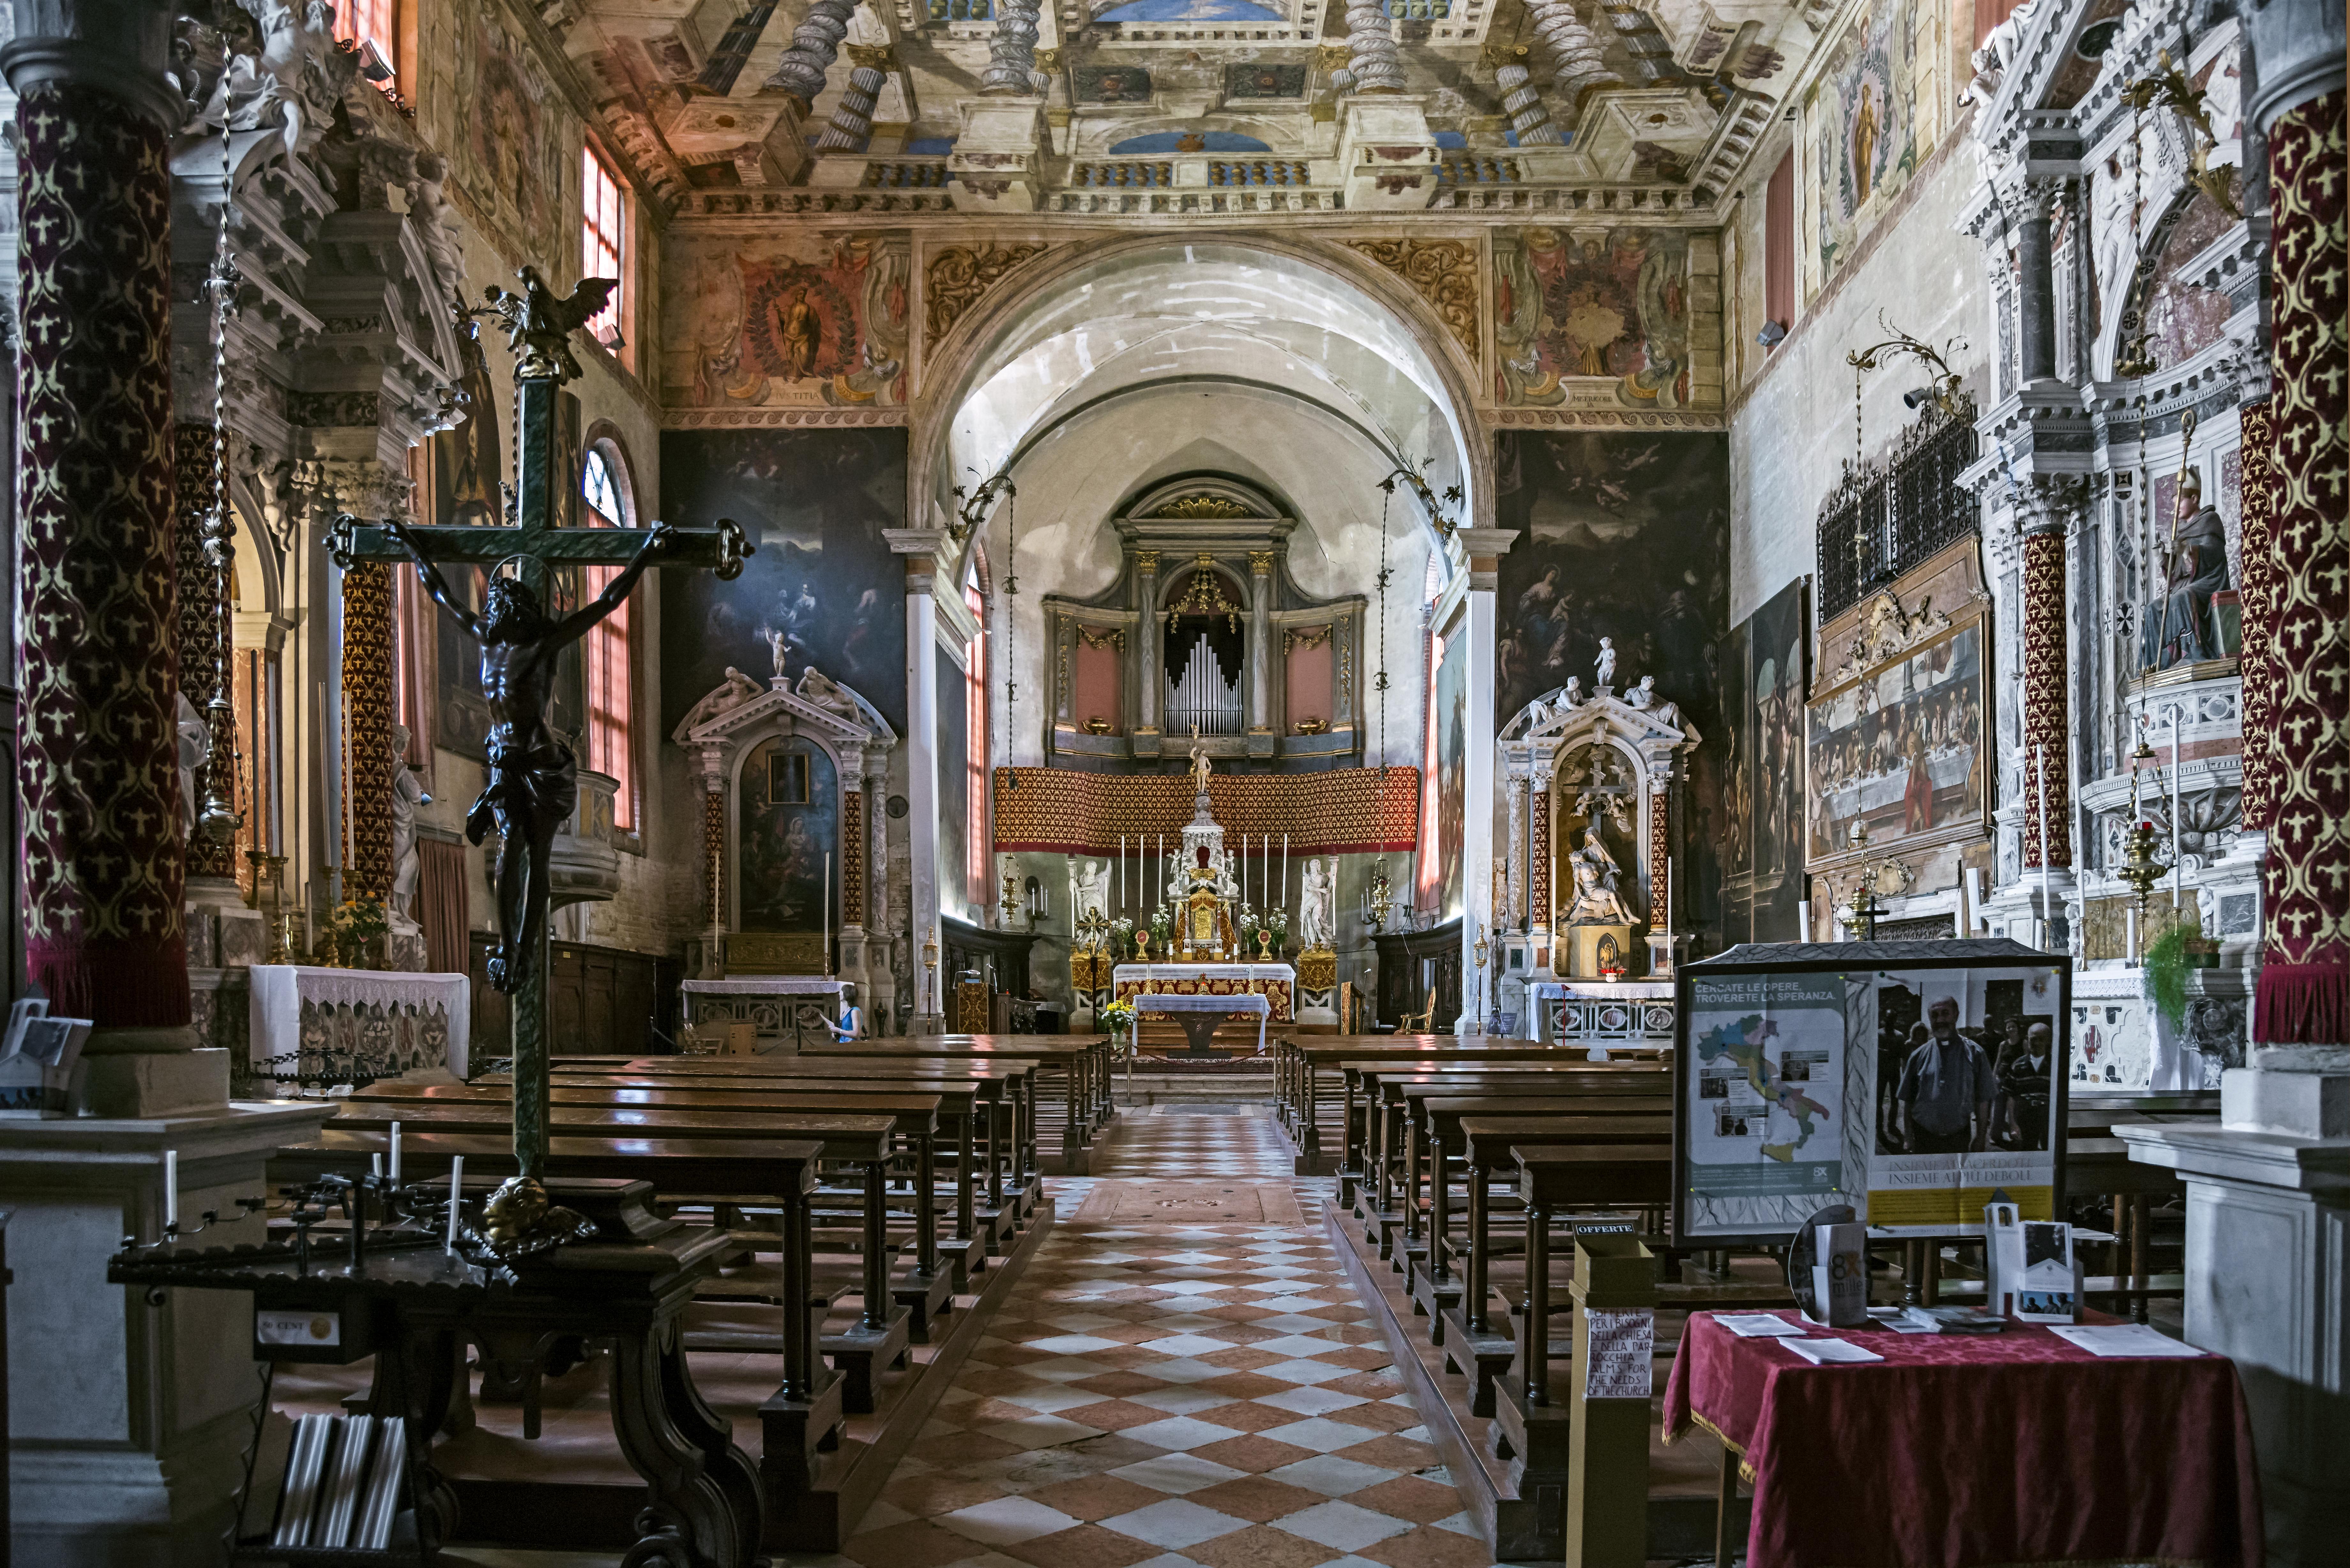 Piscina Sant Alvise Venezia.File Sant Alvise Venice Interior Jpg Wikipedia